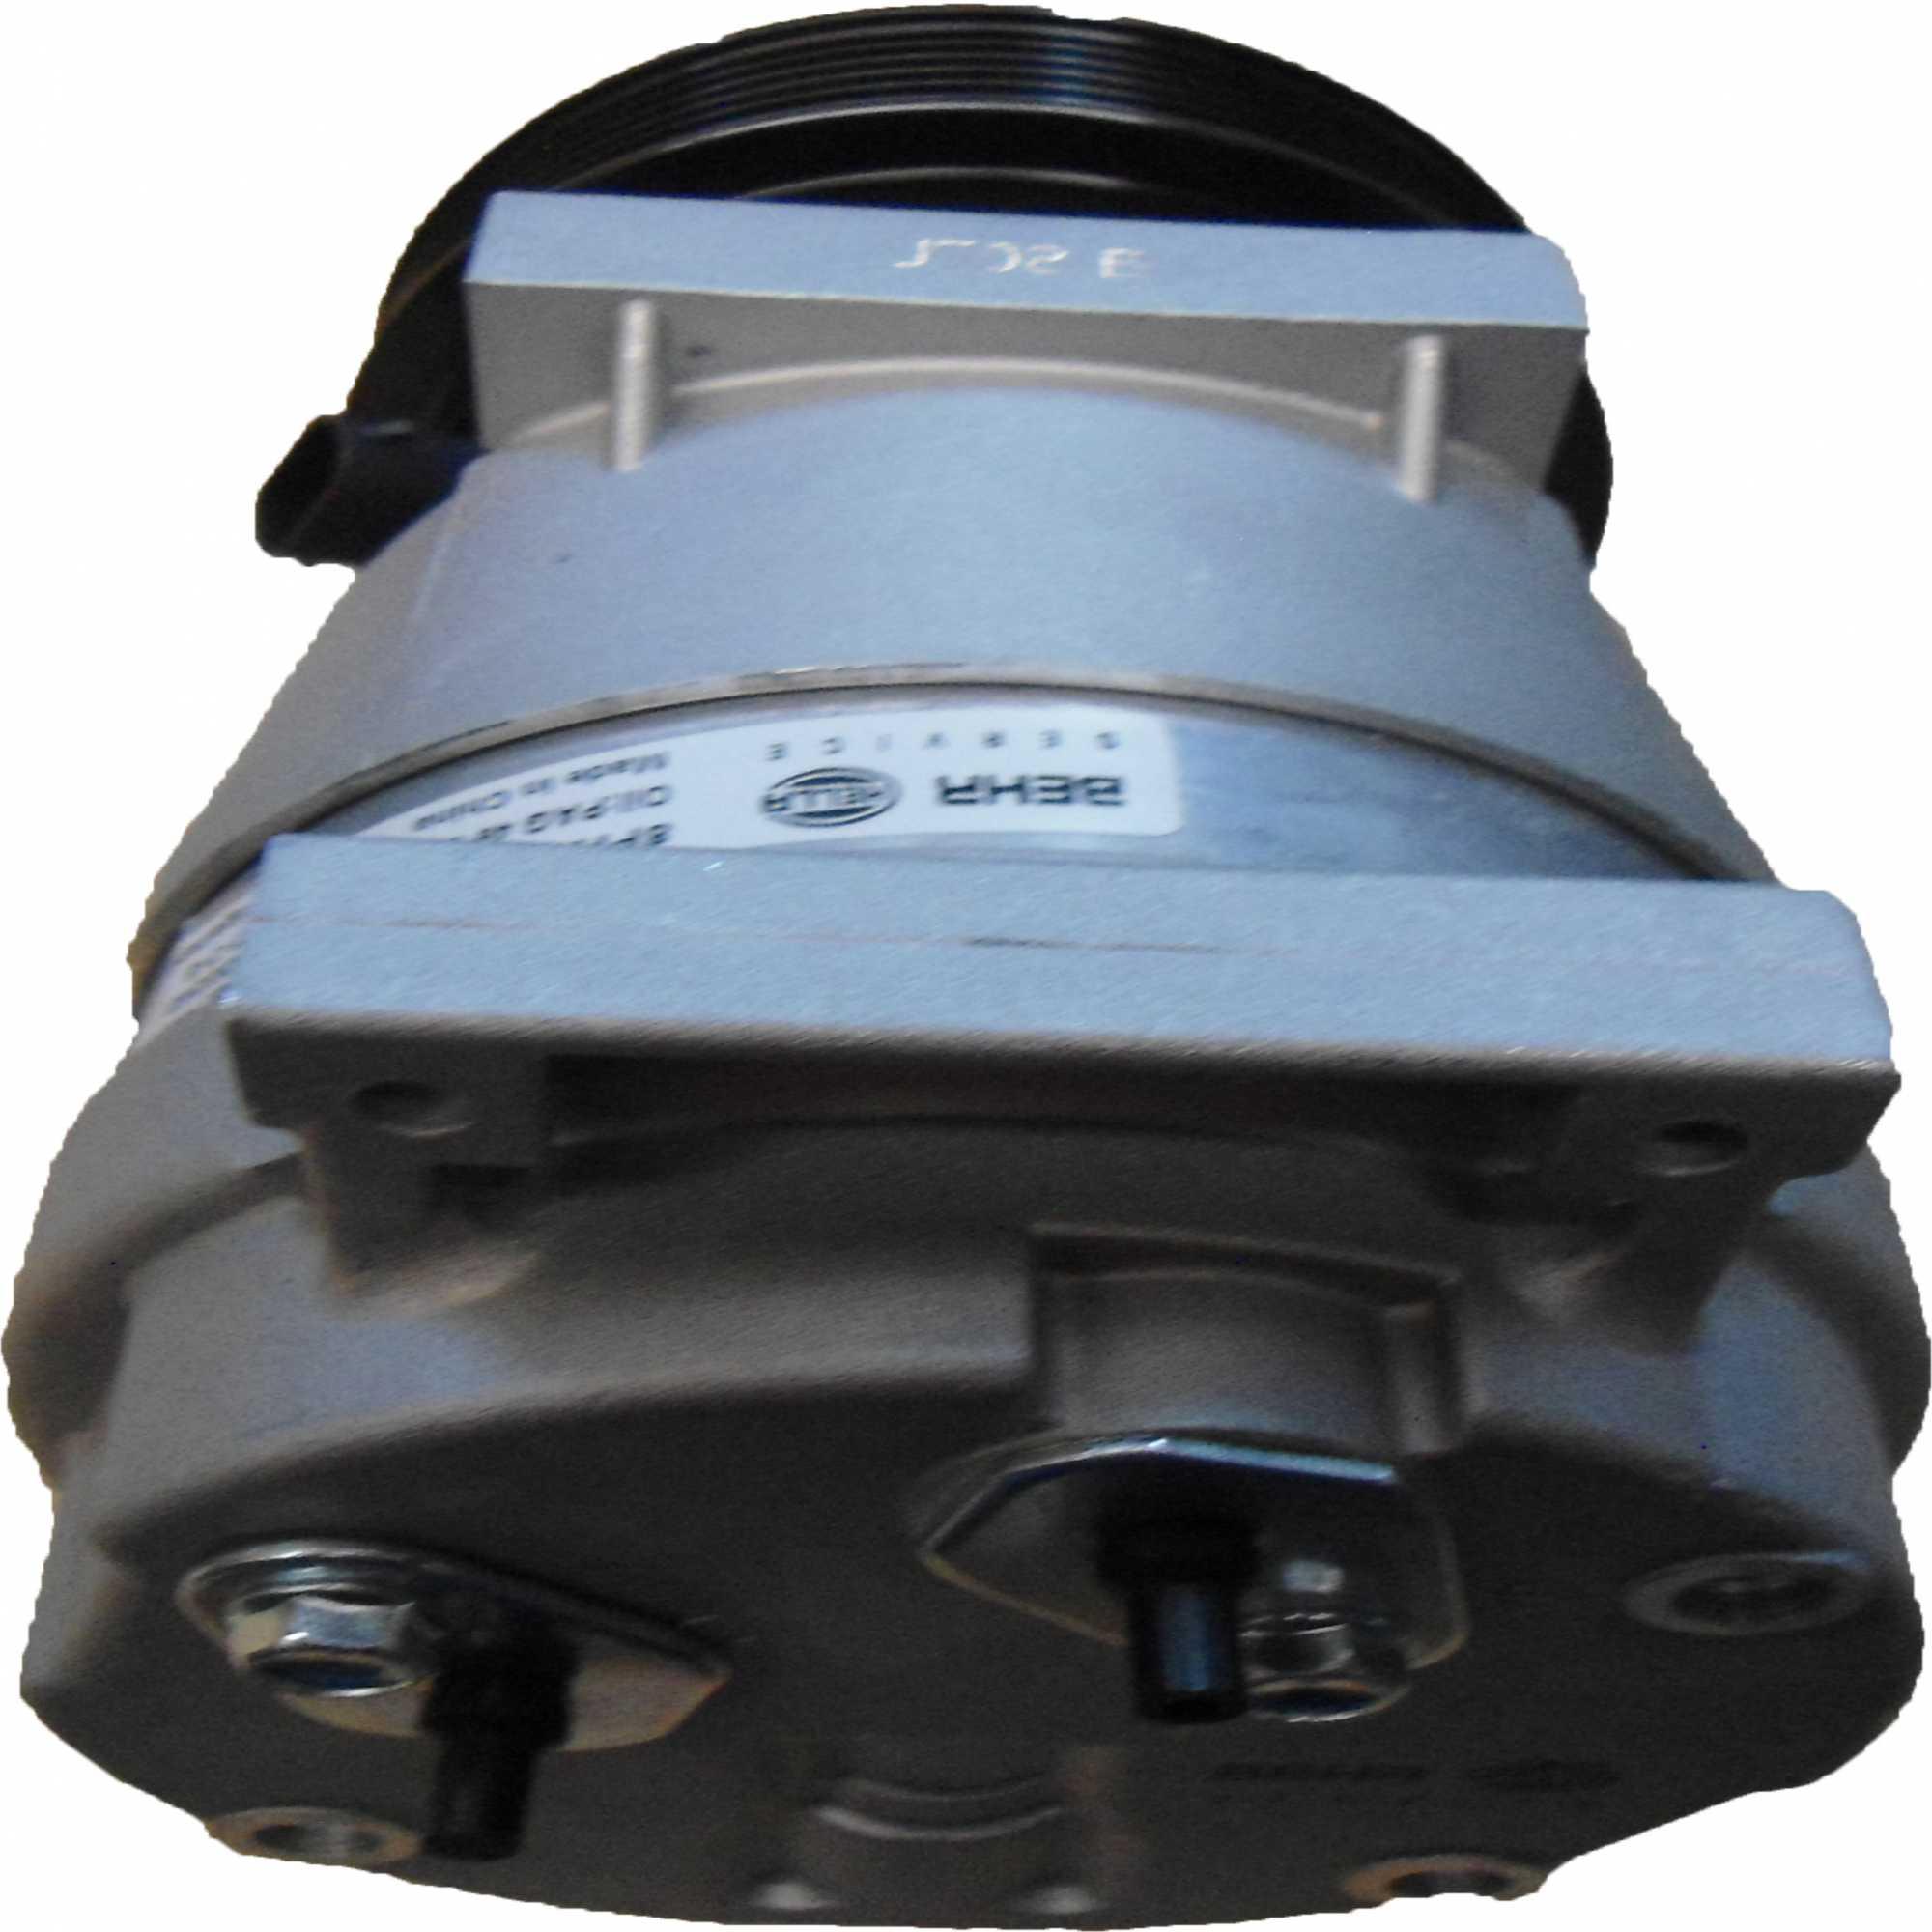 Tampa Filtro Cabine - Logan/sandero/duster Oem-8201088741